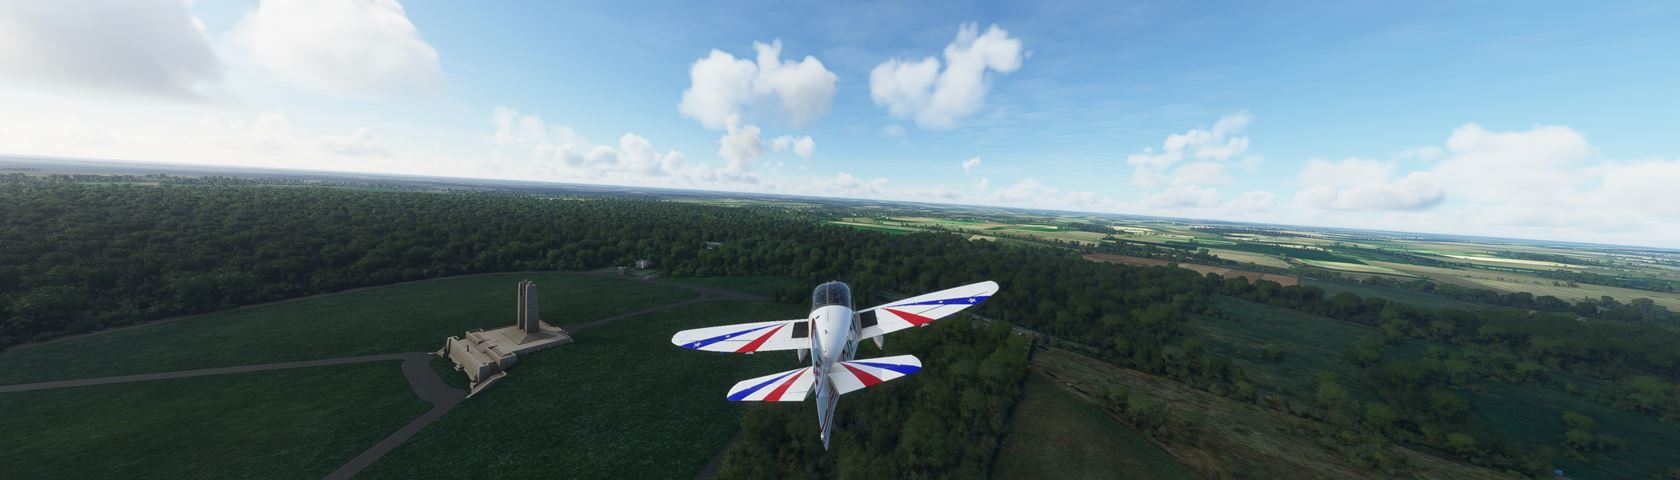 FS2020 Vimy Ridge